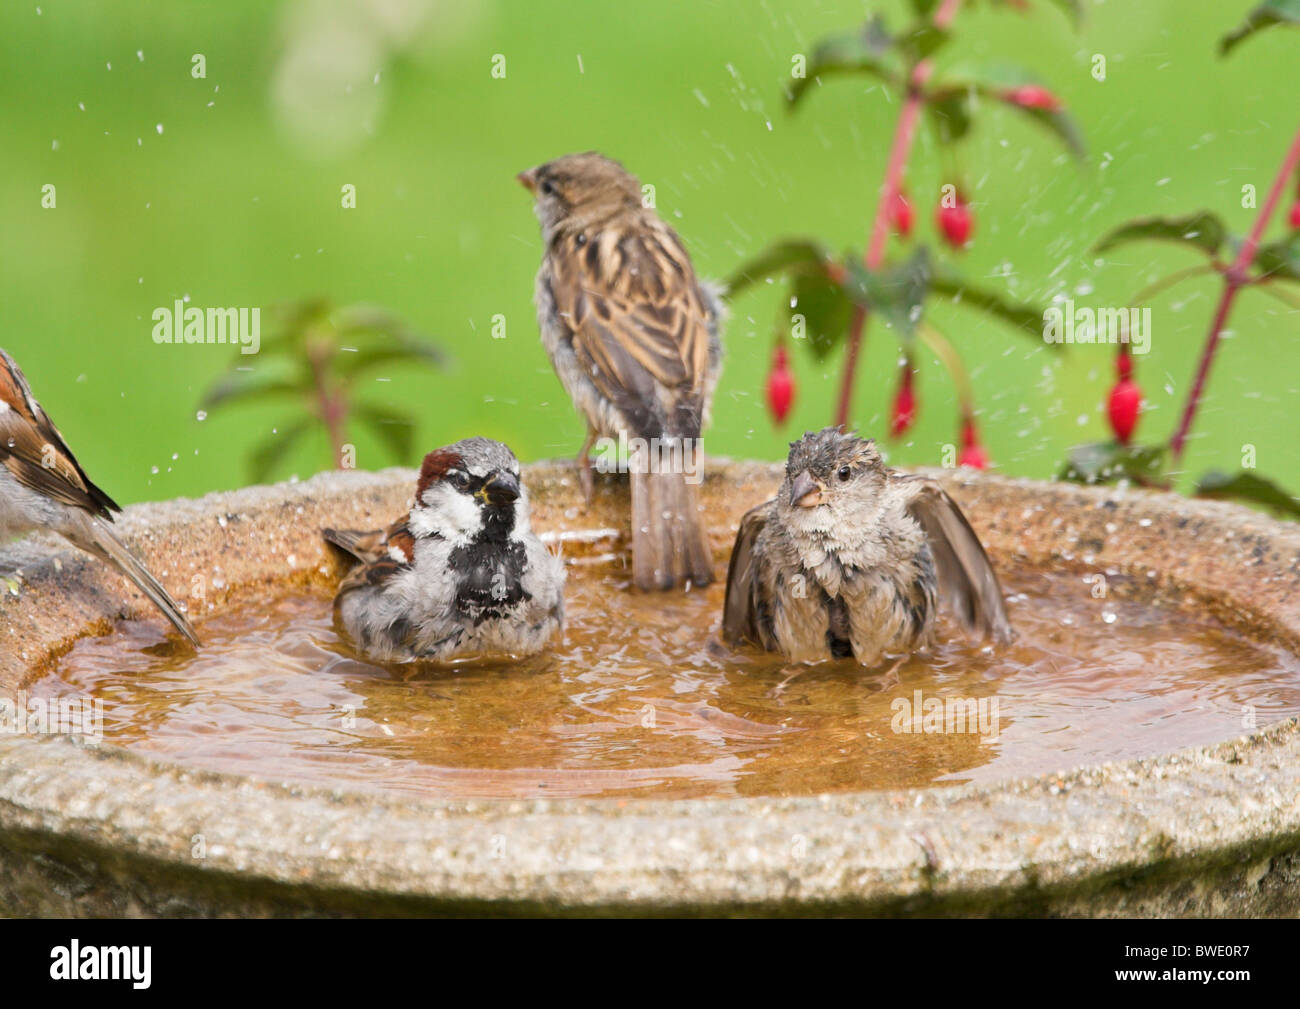 House Sparrow Passer Domesticus Group Bathing In Birdbath In Garden  Inverness Shire Highland